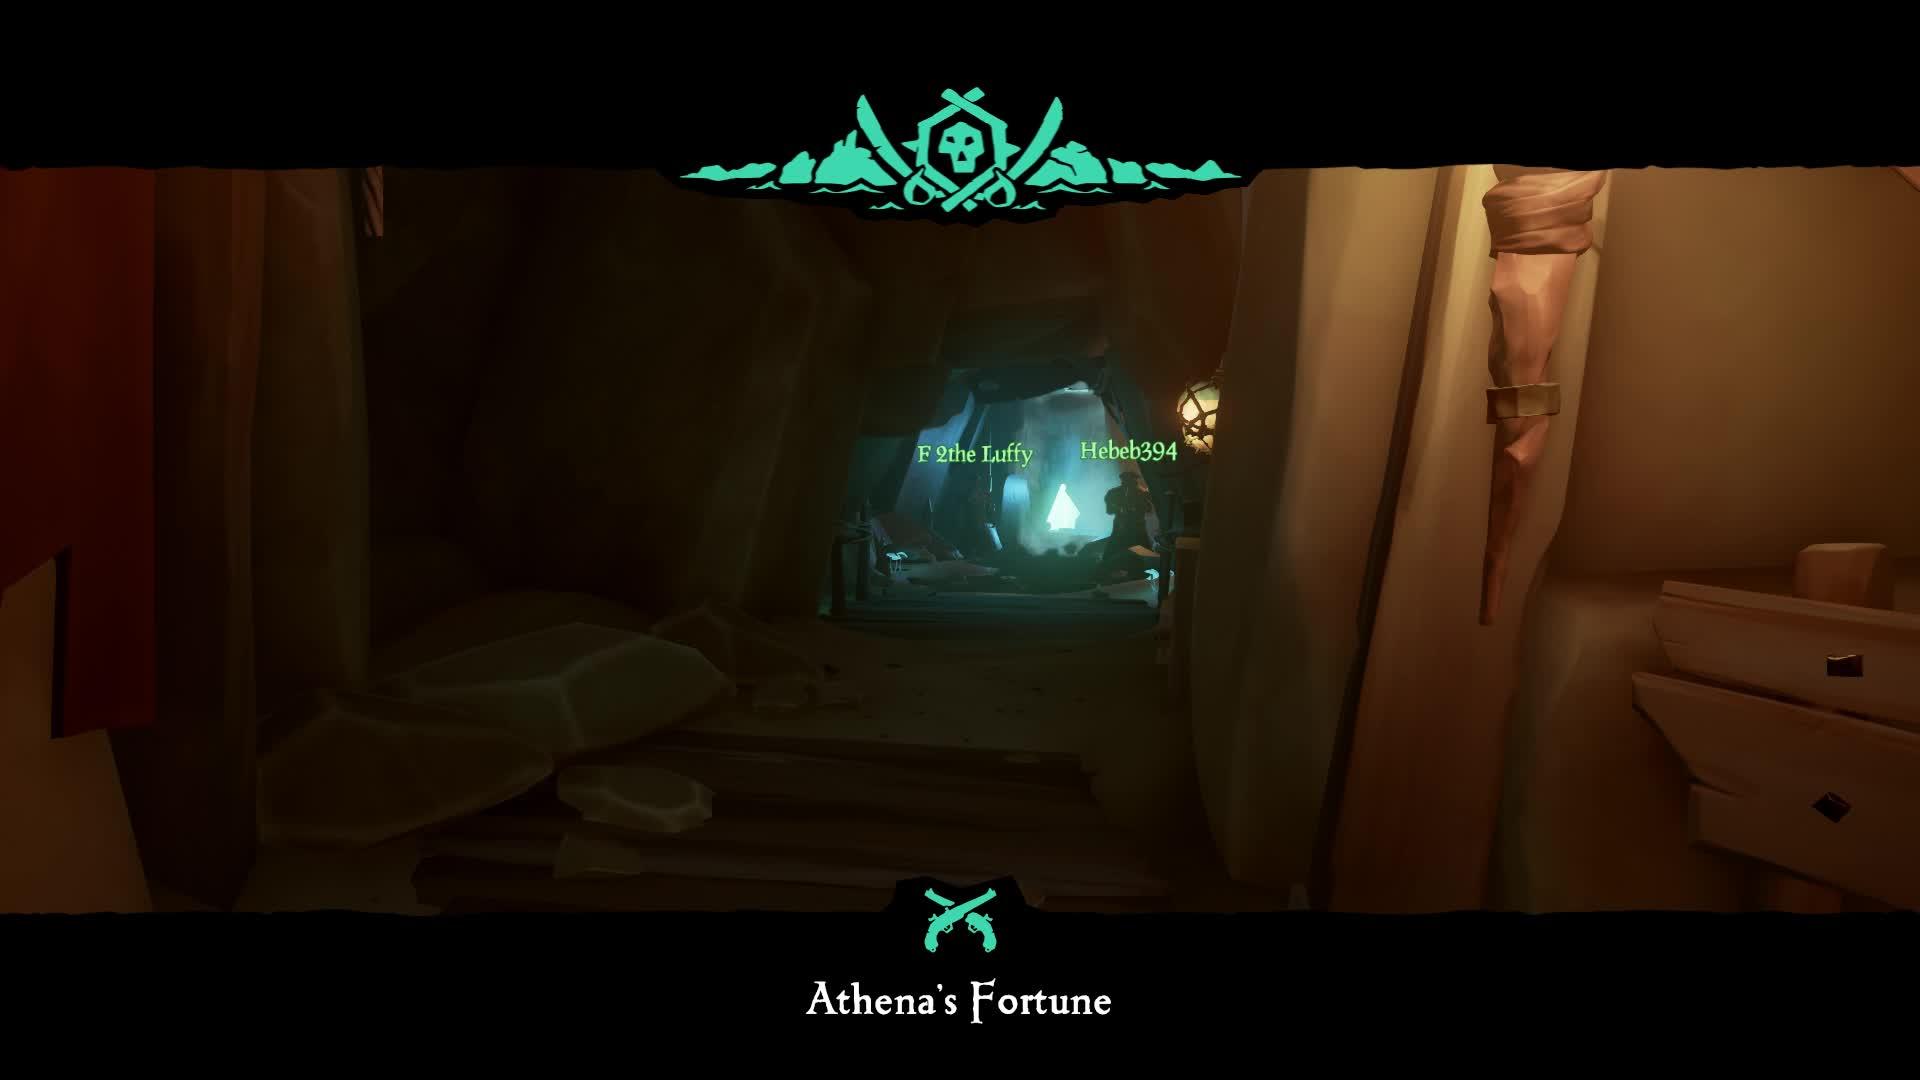 seaofthieves, Sea of Thieves 2019.03.14 - 03.50.54.56.DVR GIFs